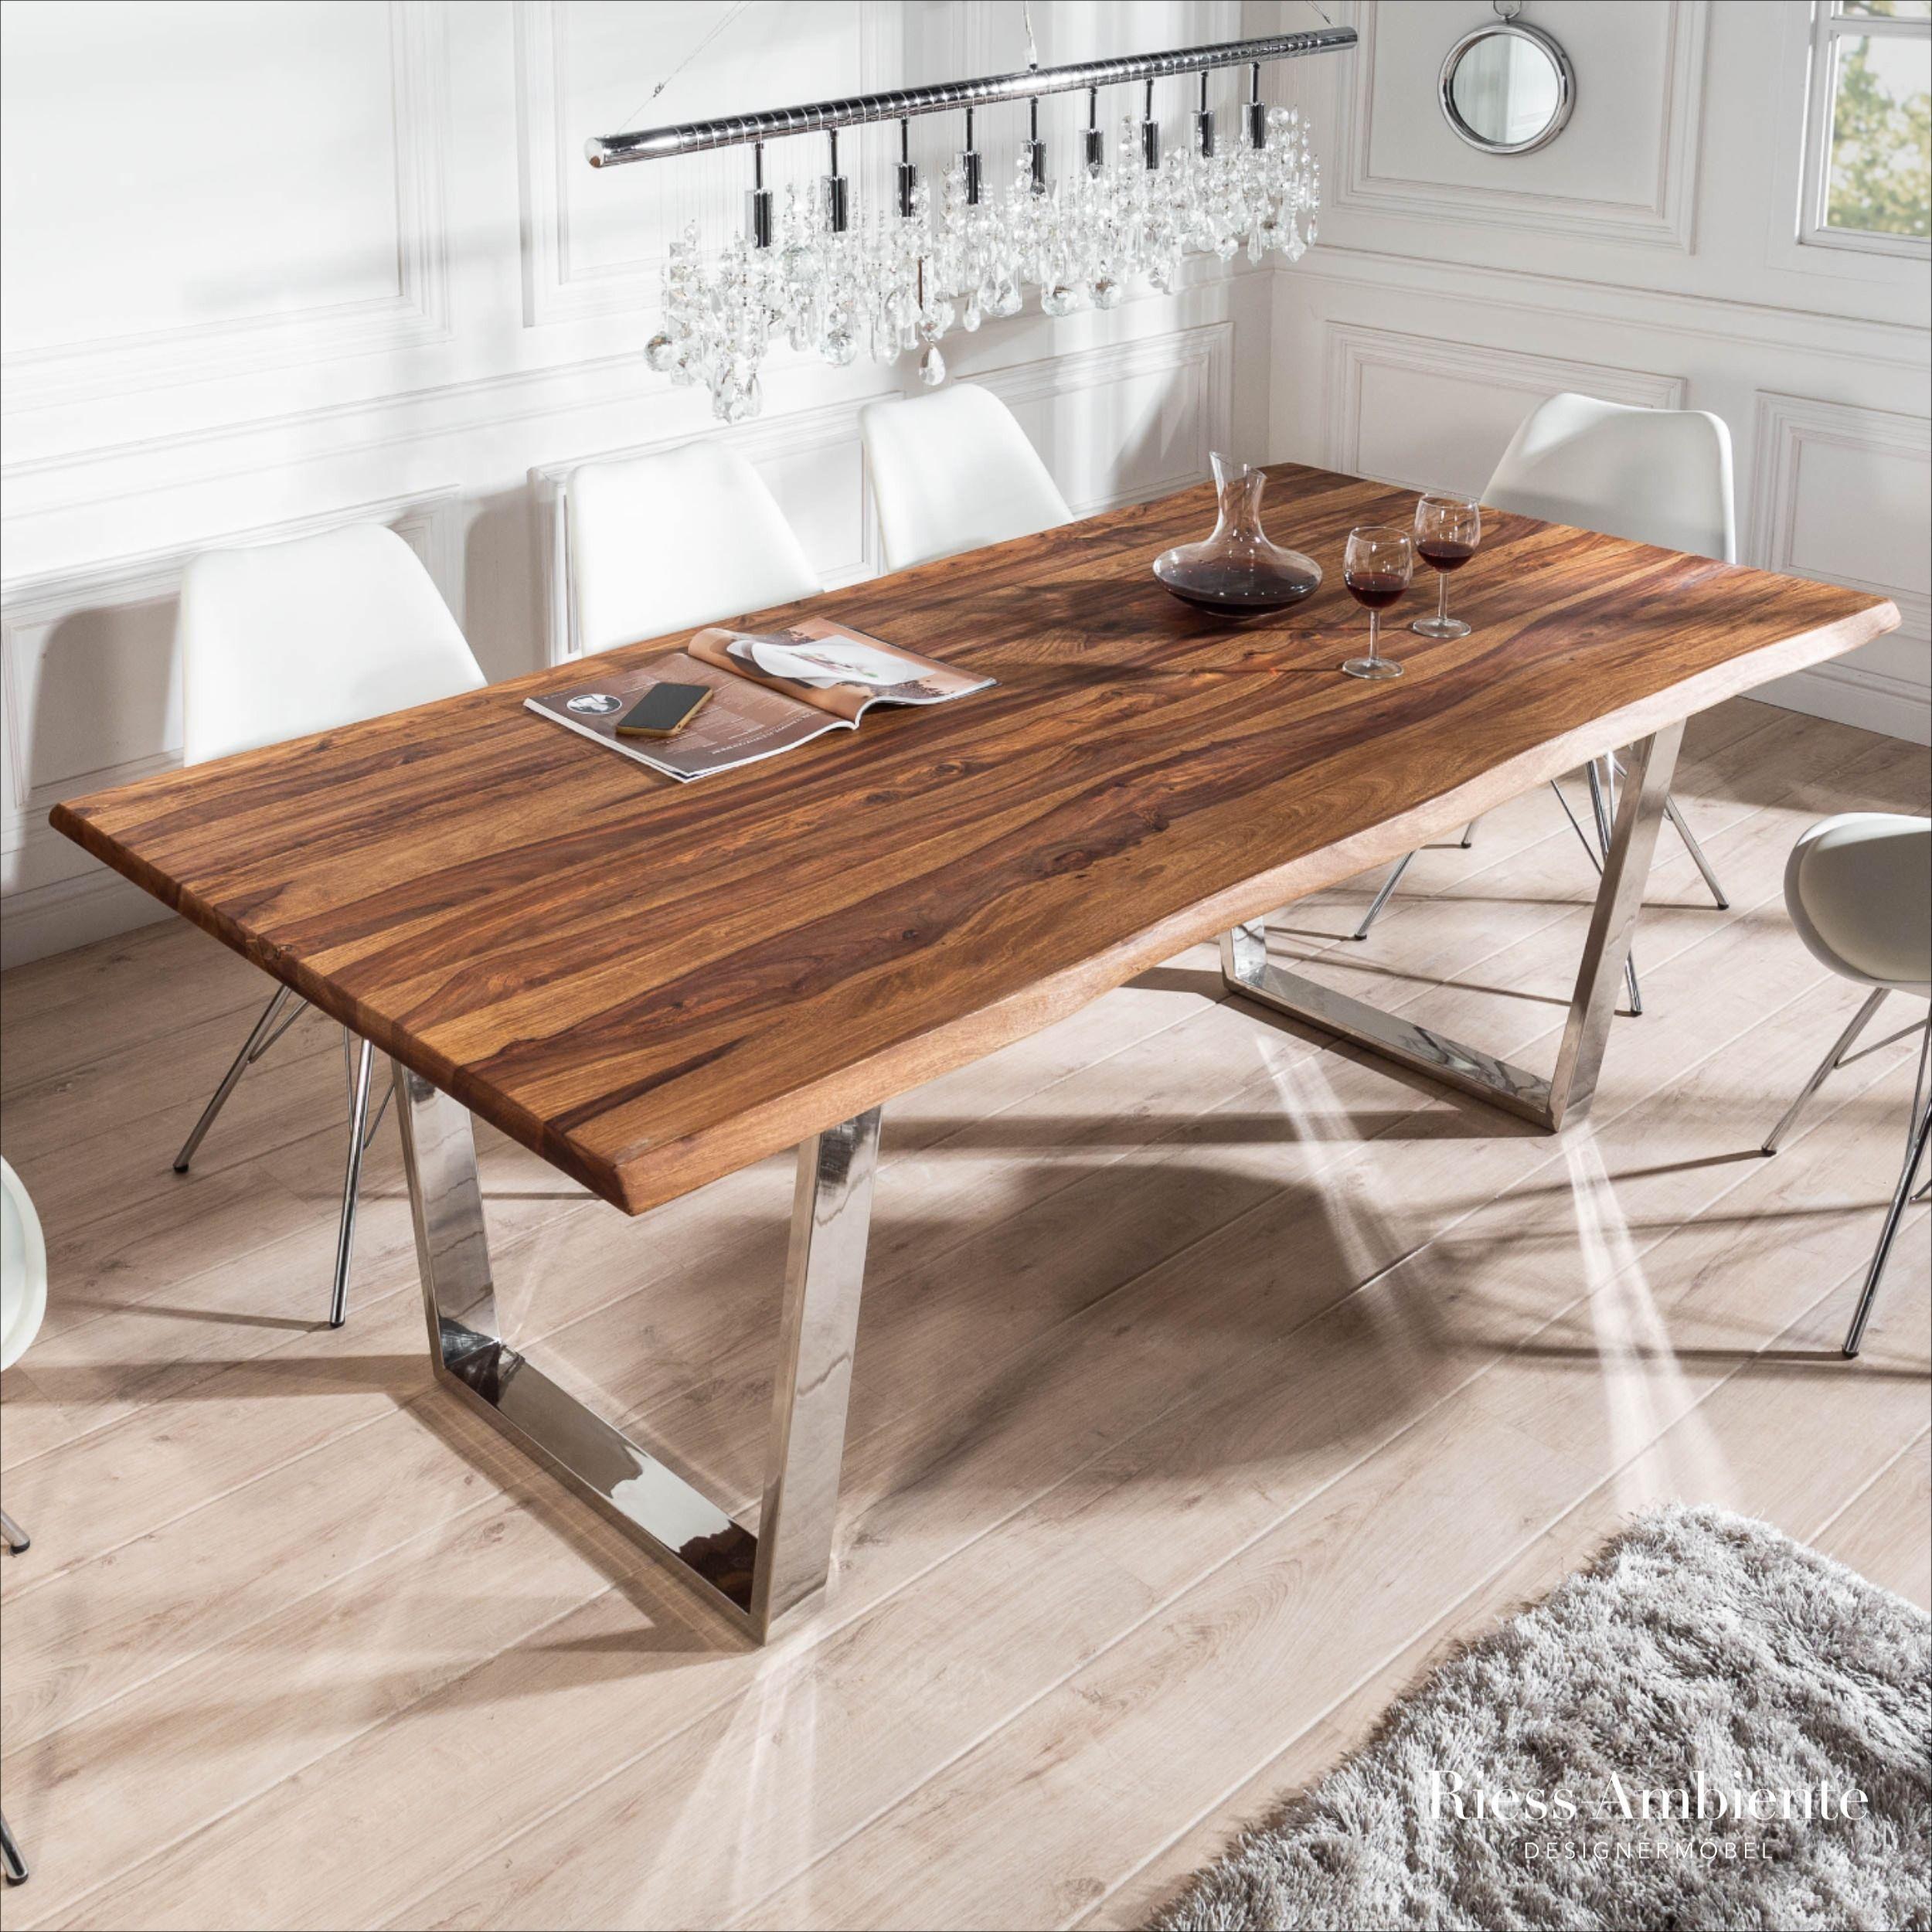 Massiver Baumstamm Esstisch Mammut 180cm Sheesham 3 5cm Tischplatte 180cm Baumstamm Esstisch Mammut Massive In 2020 Rustic Dining Table Rustic Dining Home Decor